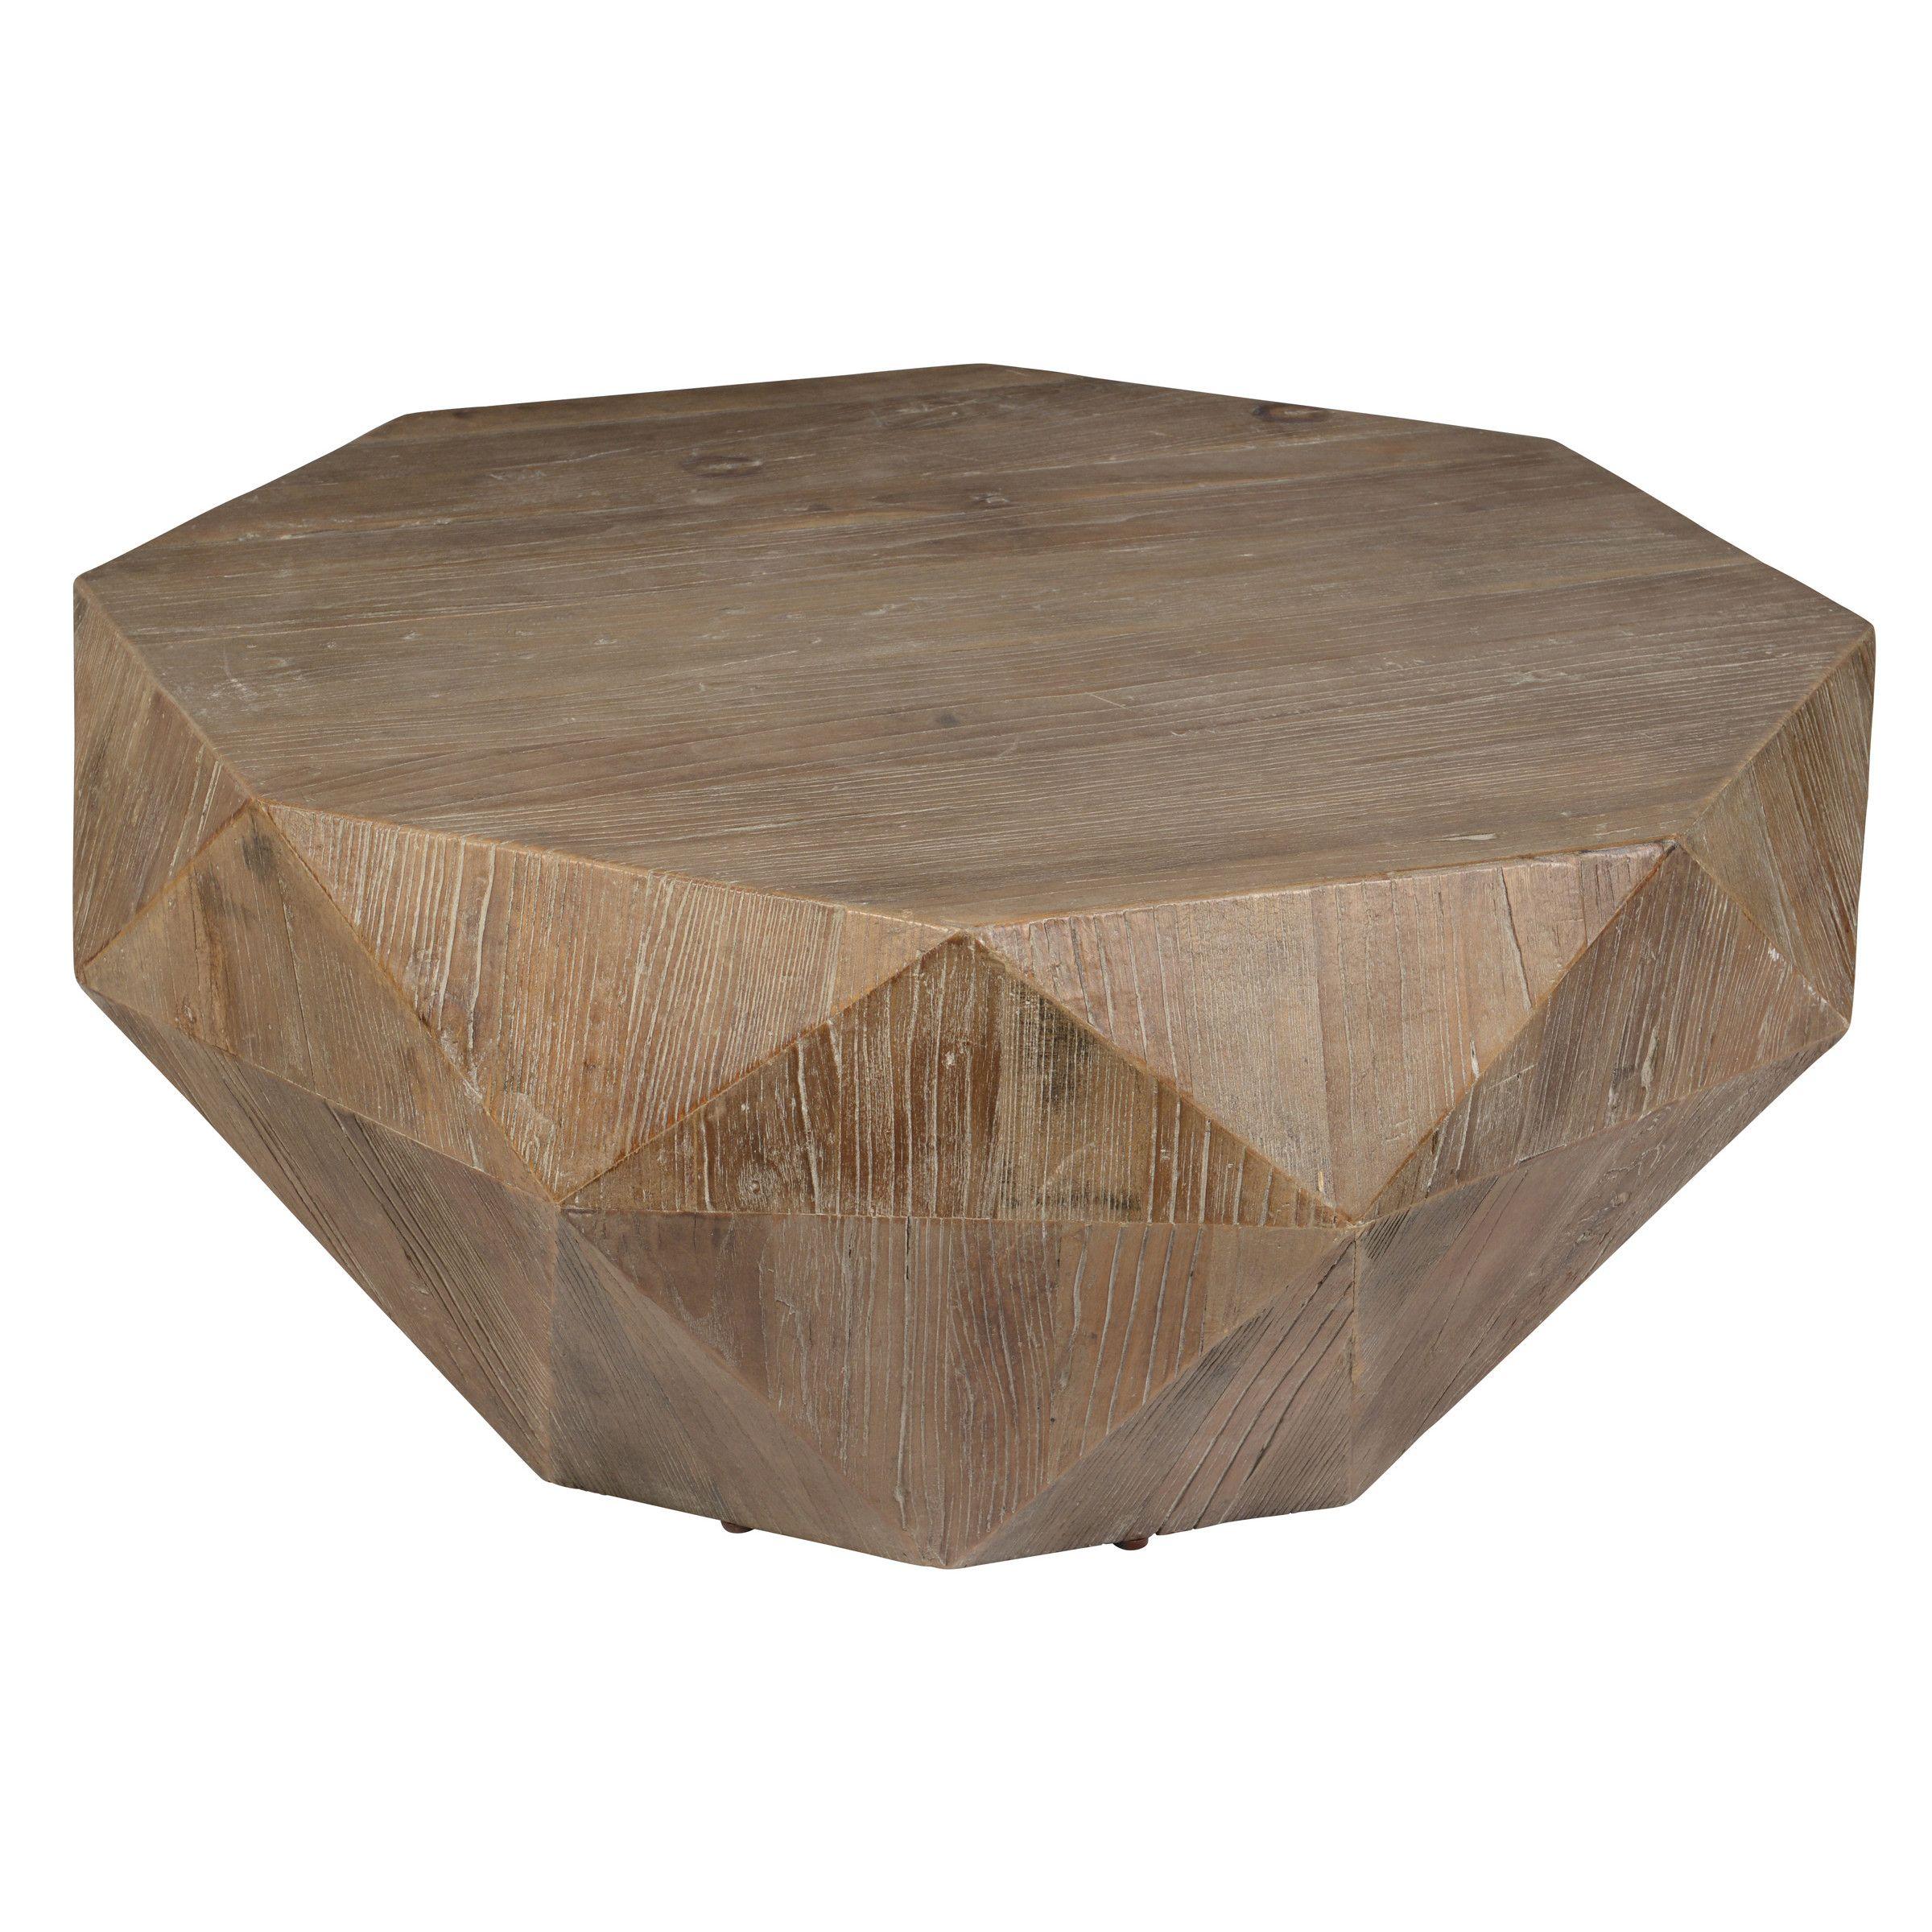 Bungalow Rose Armenia Coffee Table Coffee Table Wood Reclaimed Wood Coffee Table Coffee Table [ 2400 x 2400 Pixel ]